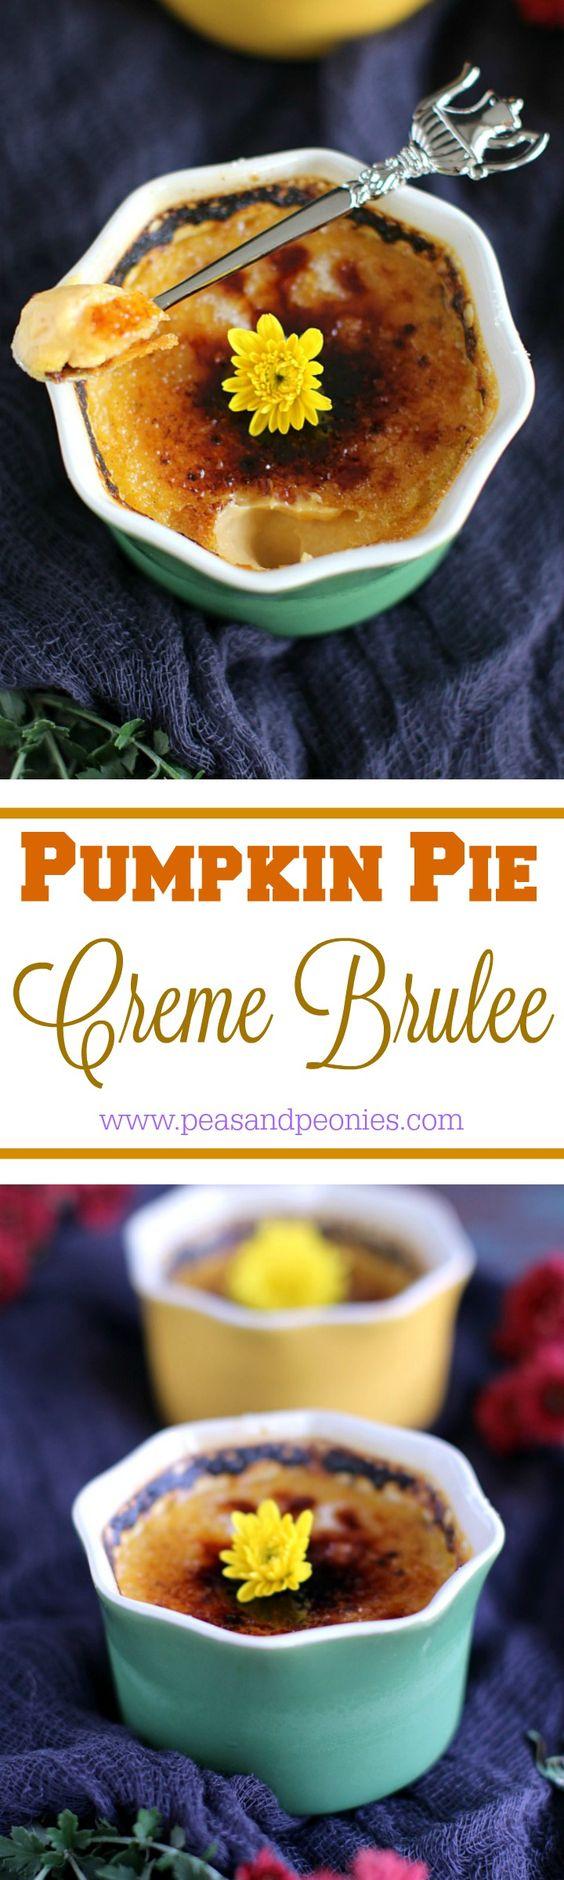 Pumpkin Pie Creme Brûlée - This pumpkin pie creme brulee is a French ...